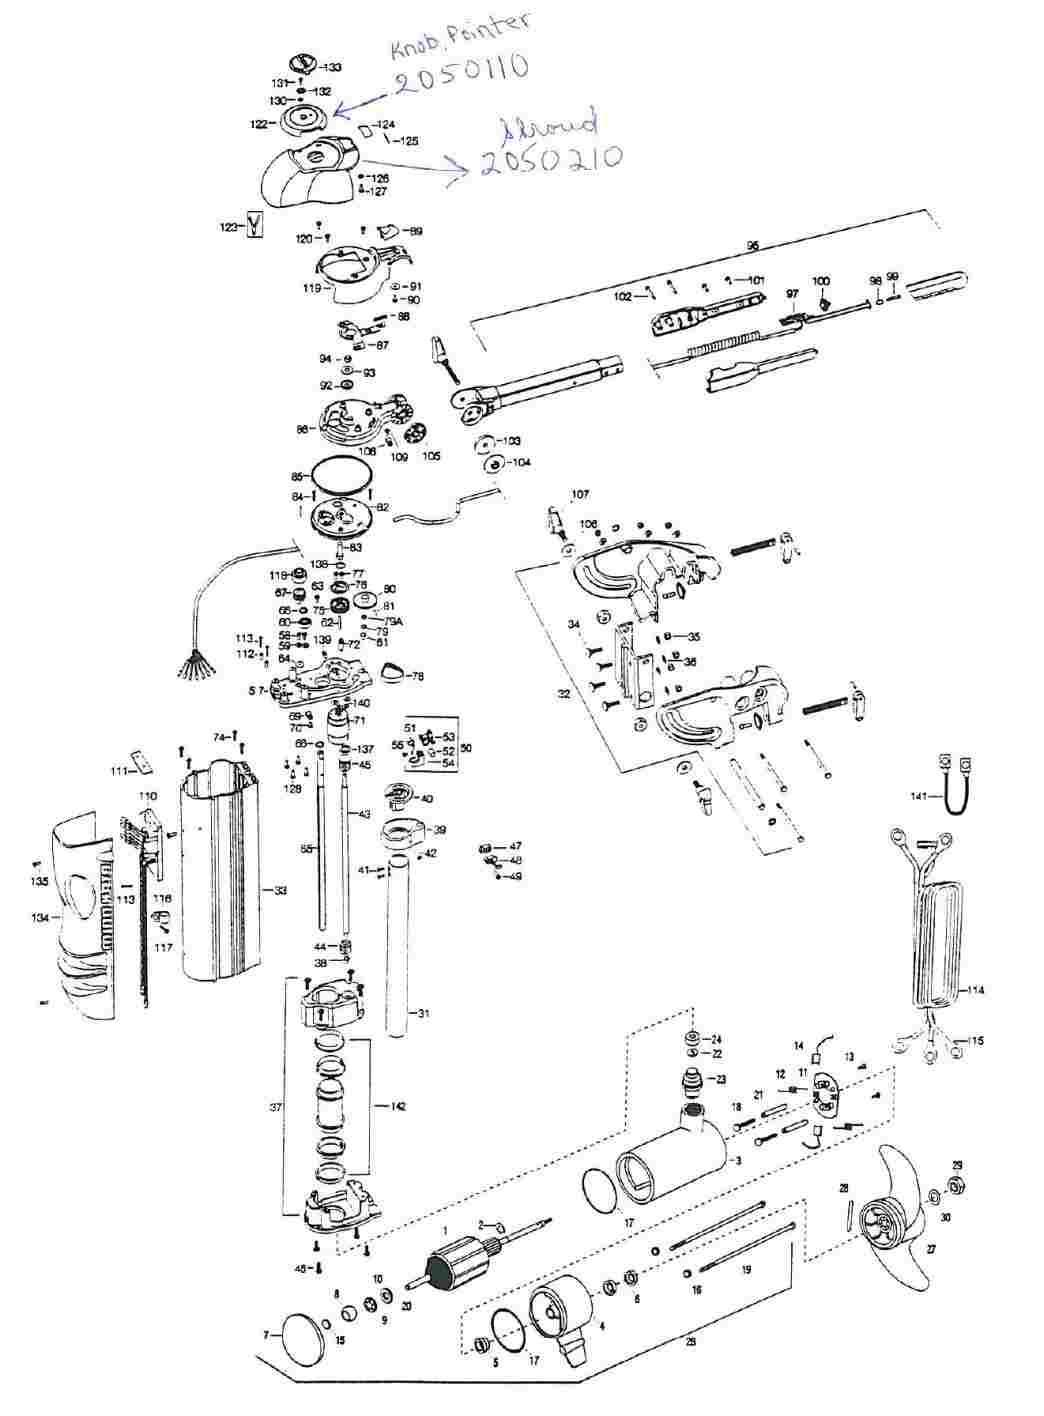 Wiring       Diagram    For Minn    Kota    Trolling Motors  impremedia